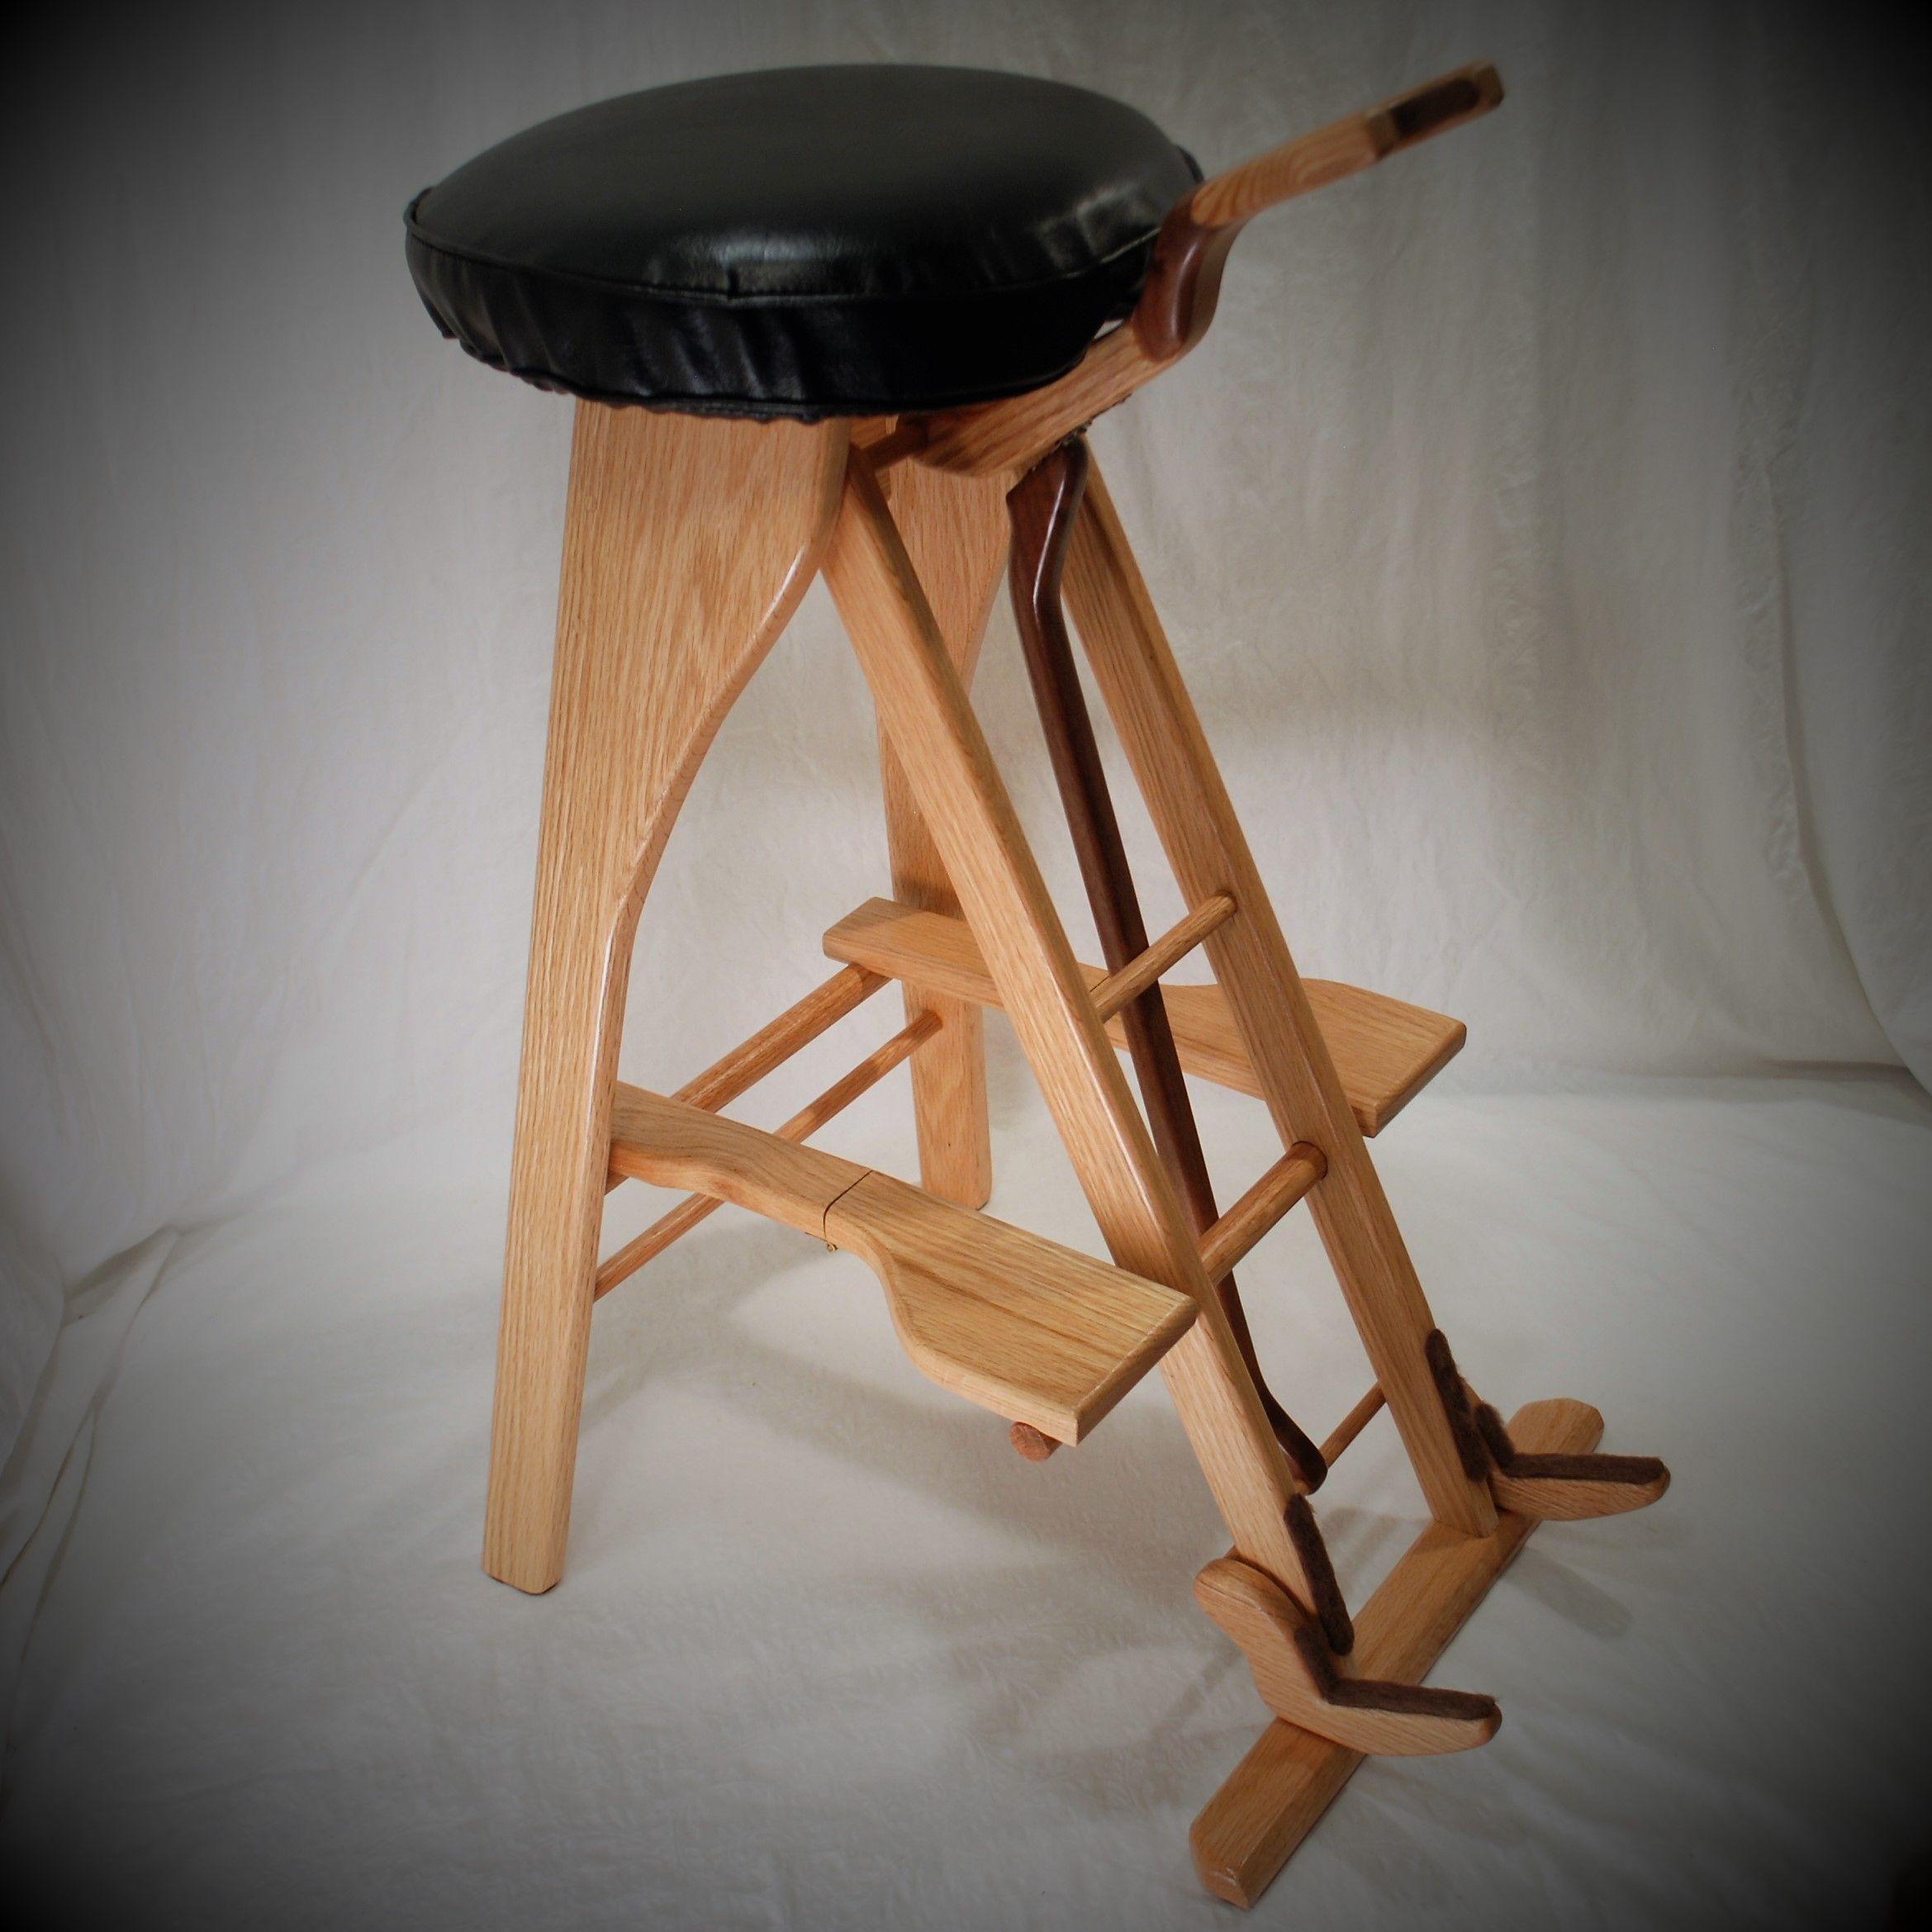 guitar stool stand by south mountain woodworks carpinteria carpinteria. Black Bedroom Furniture Sets. Home Design Ideas